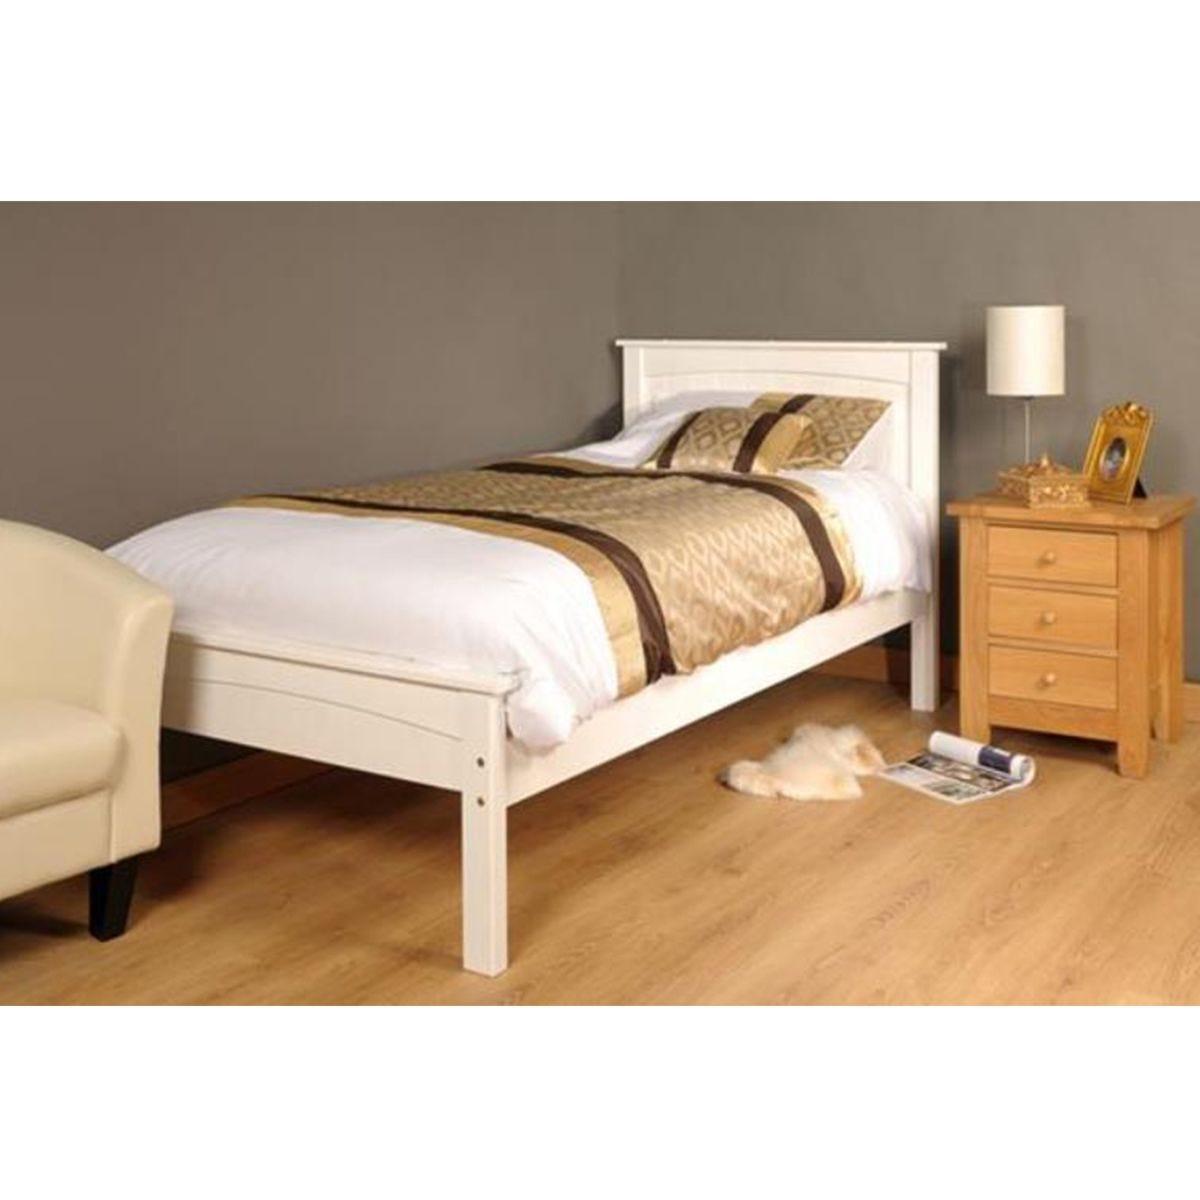 Ludza Bed Frame - White